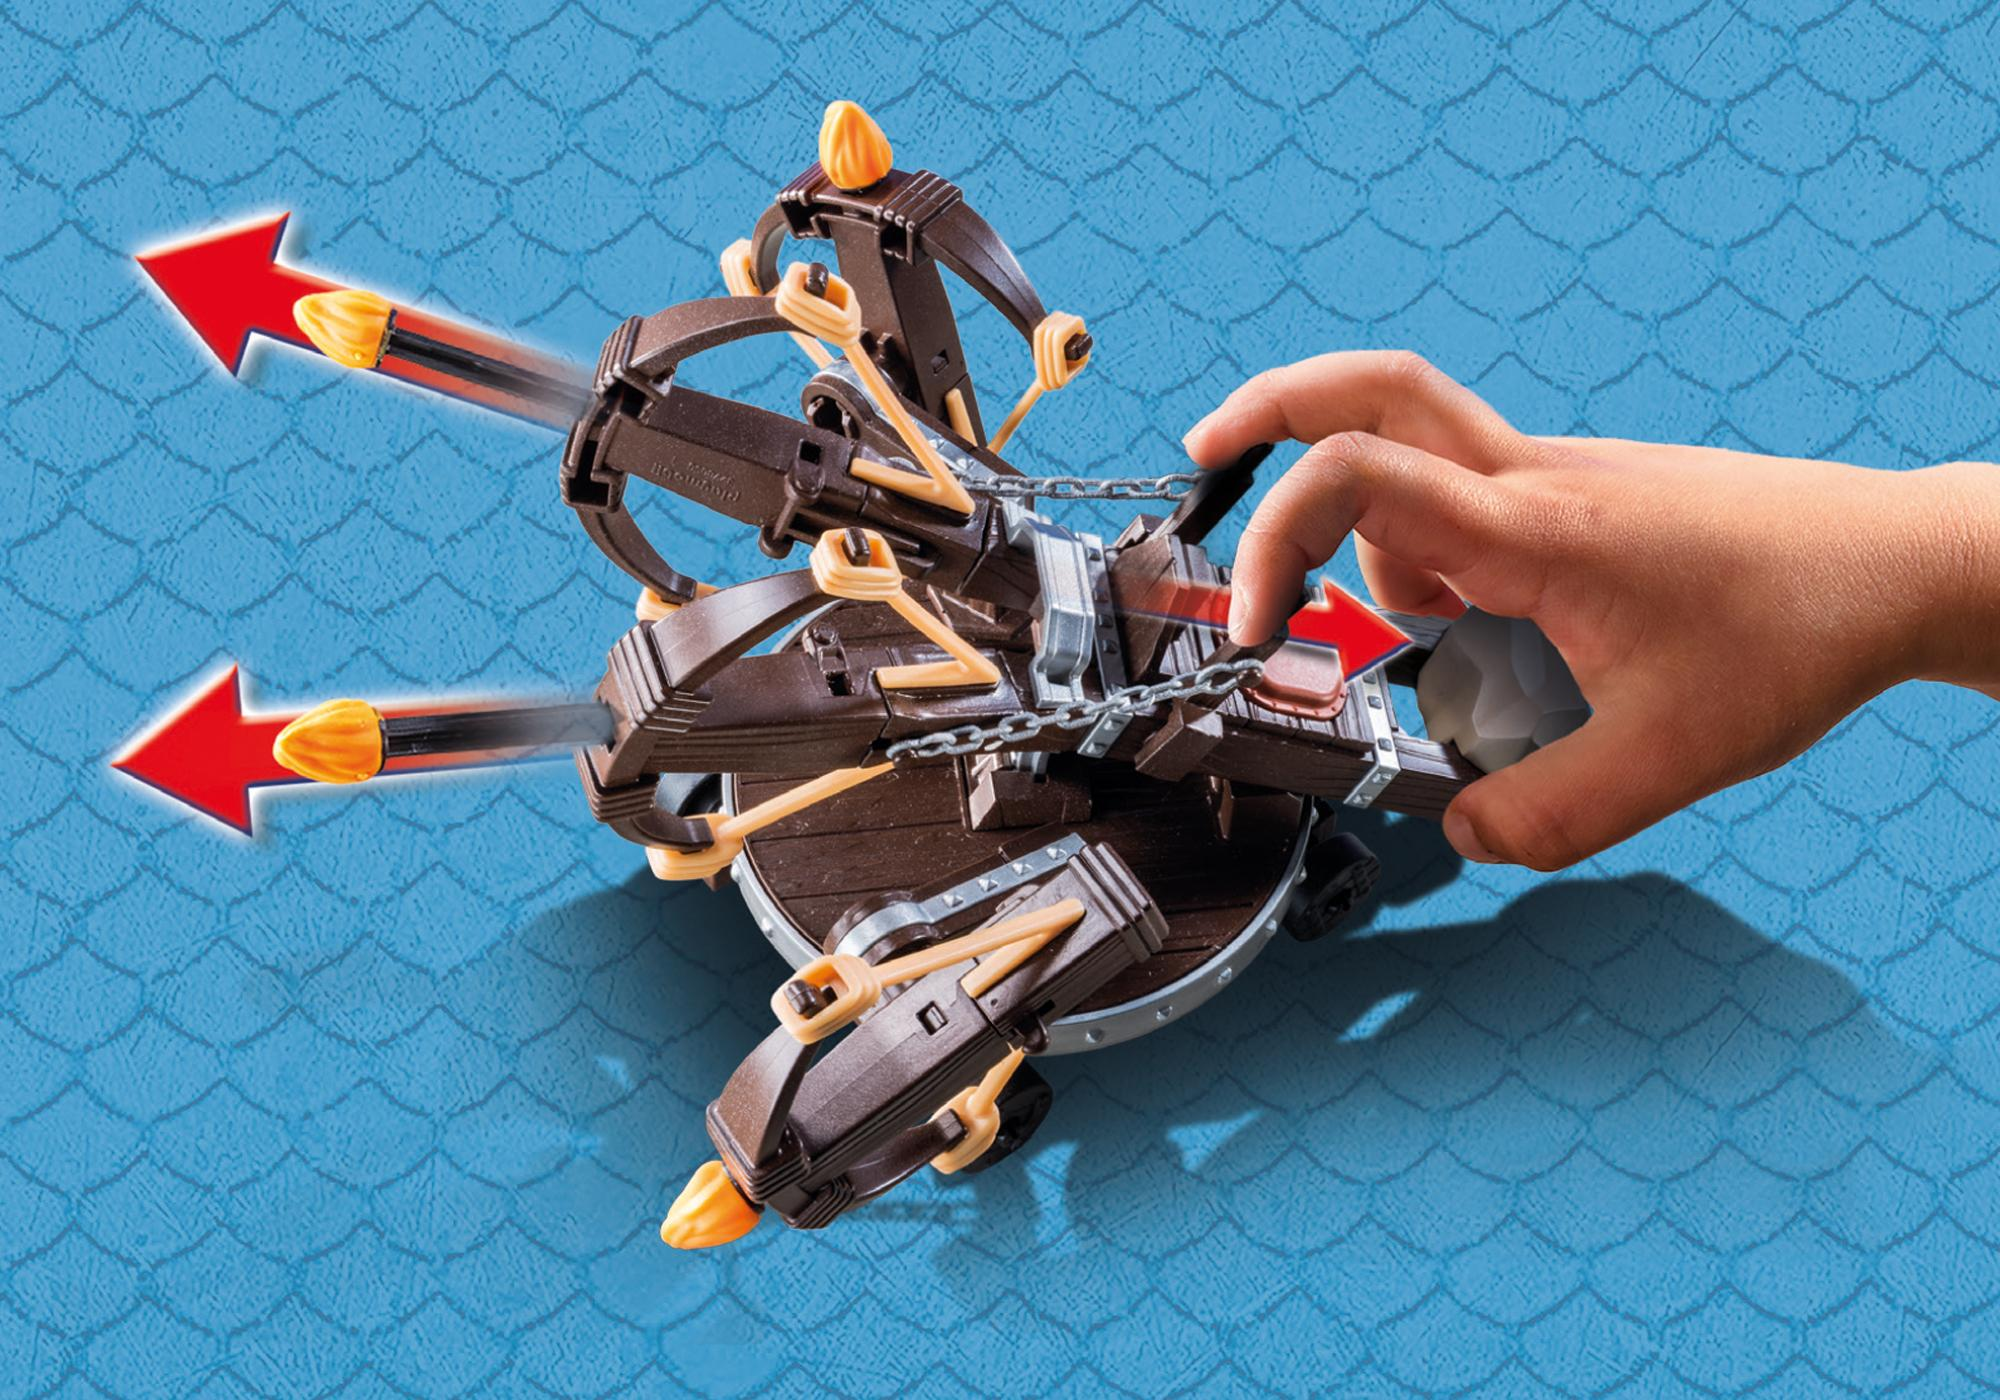 http://media.playmobil.com/i/playmobil/9249_product_extra1/Эрет с 4-х зарядной баллистой